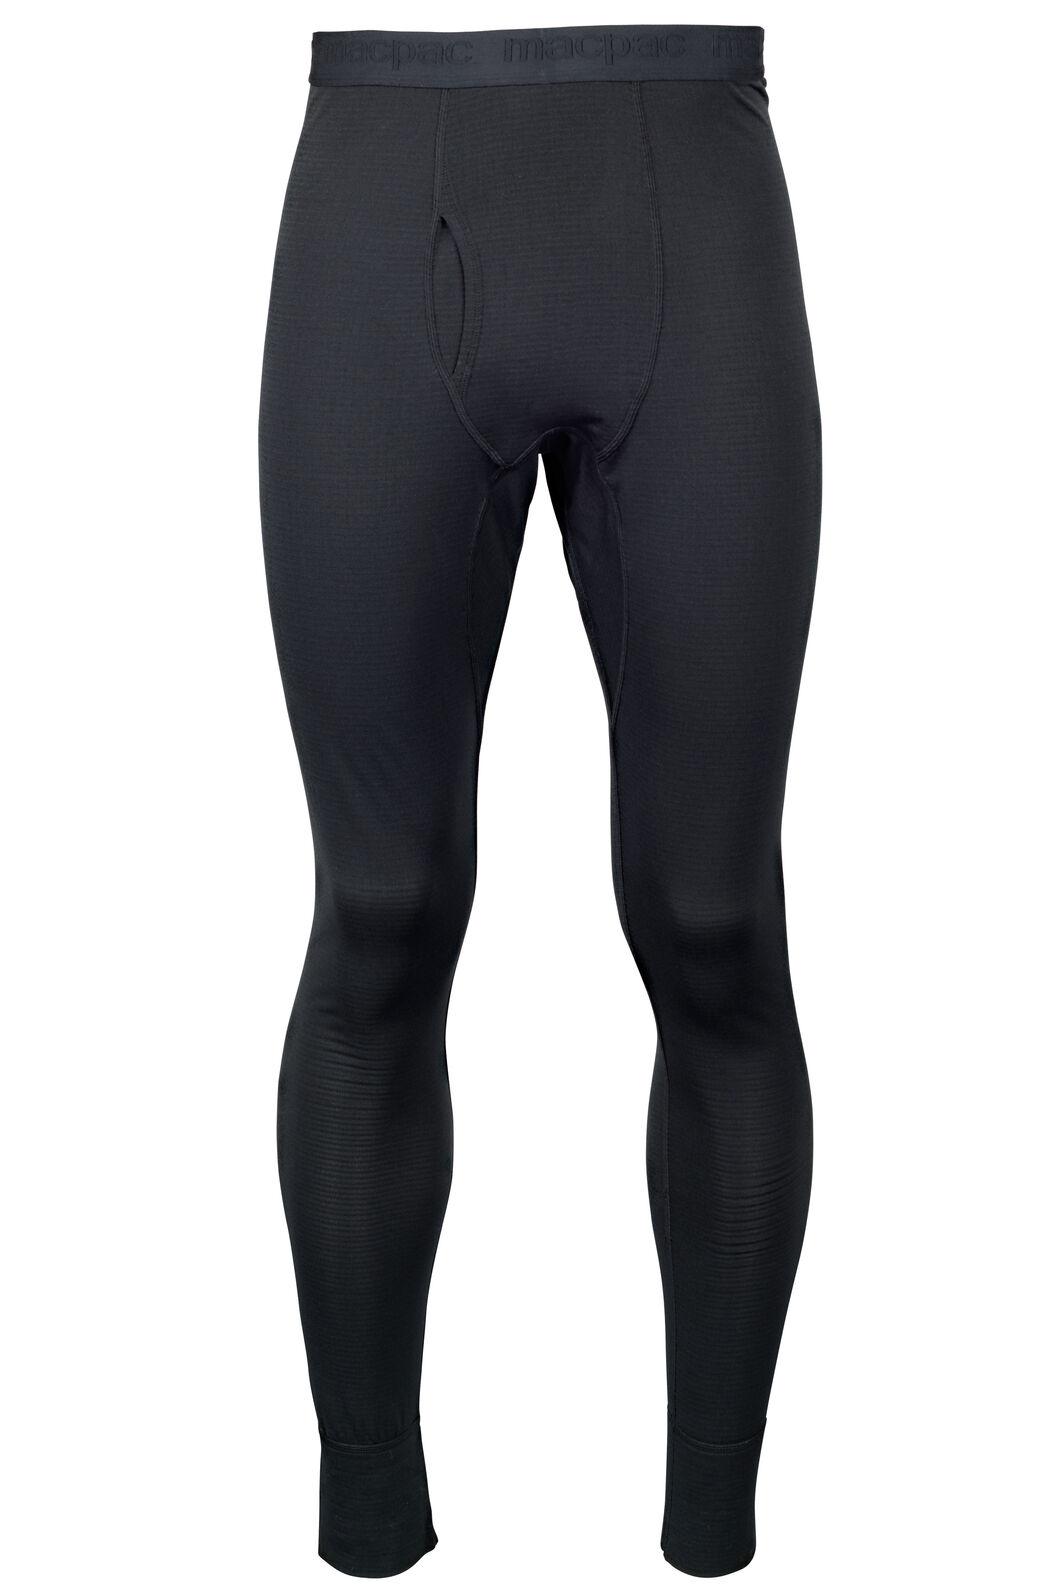 Macpac Men's Prothermal Polartec® Long Johns, Black, hi-res